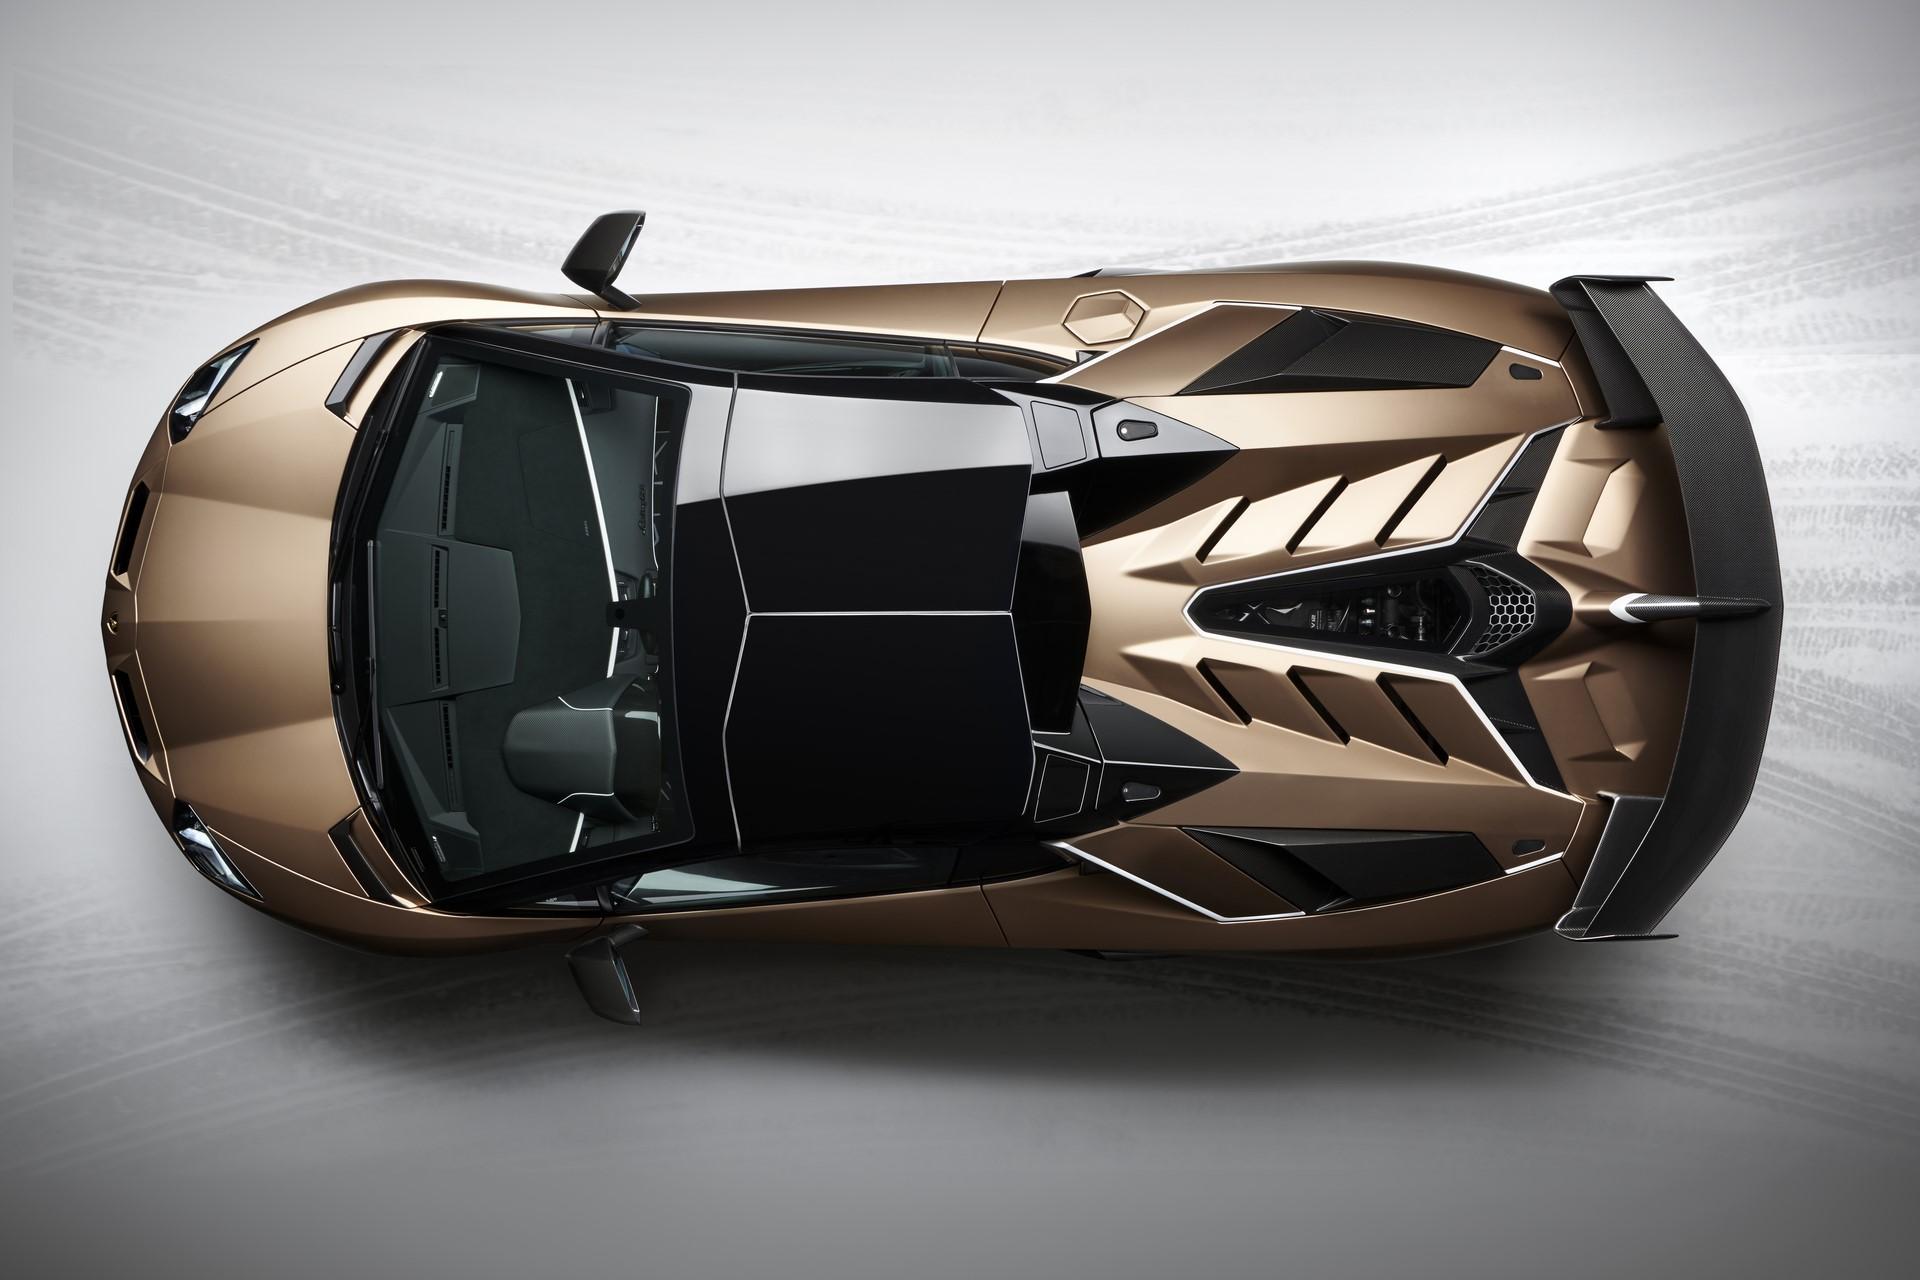 Lamborghini Aventador SVJ Roadster (18)